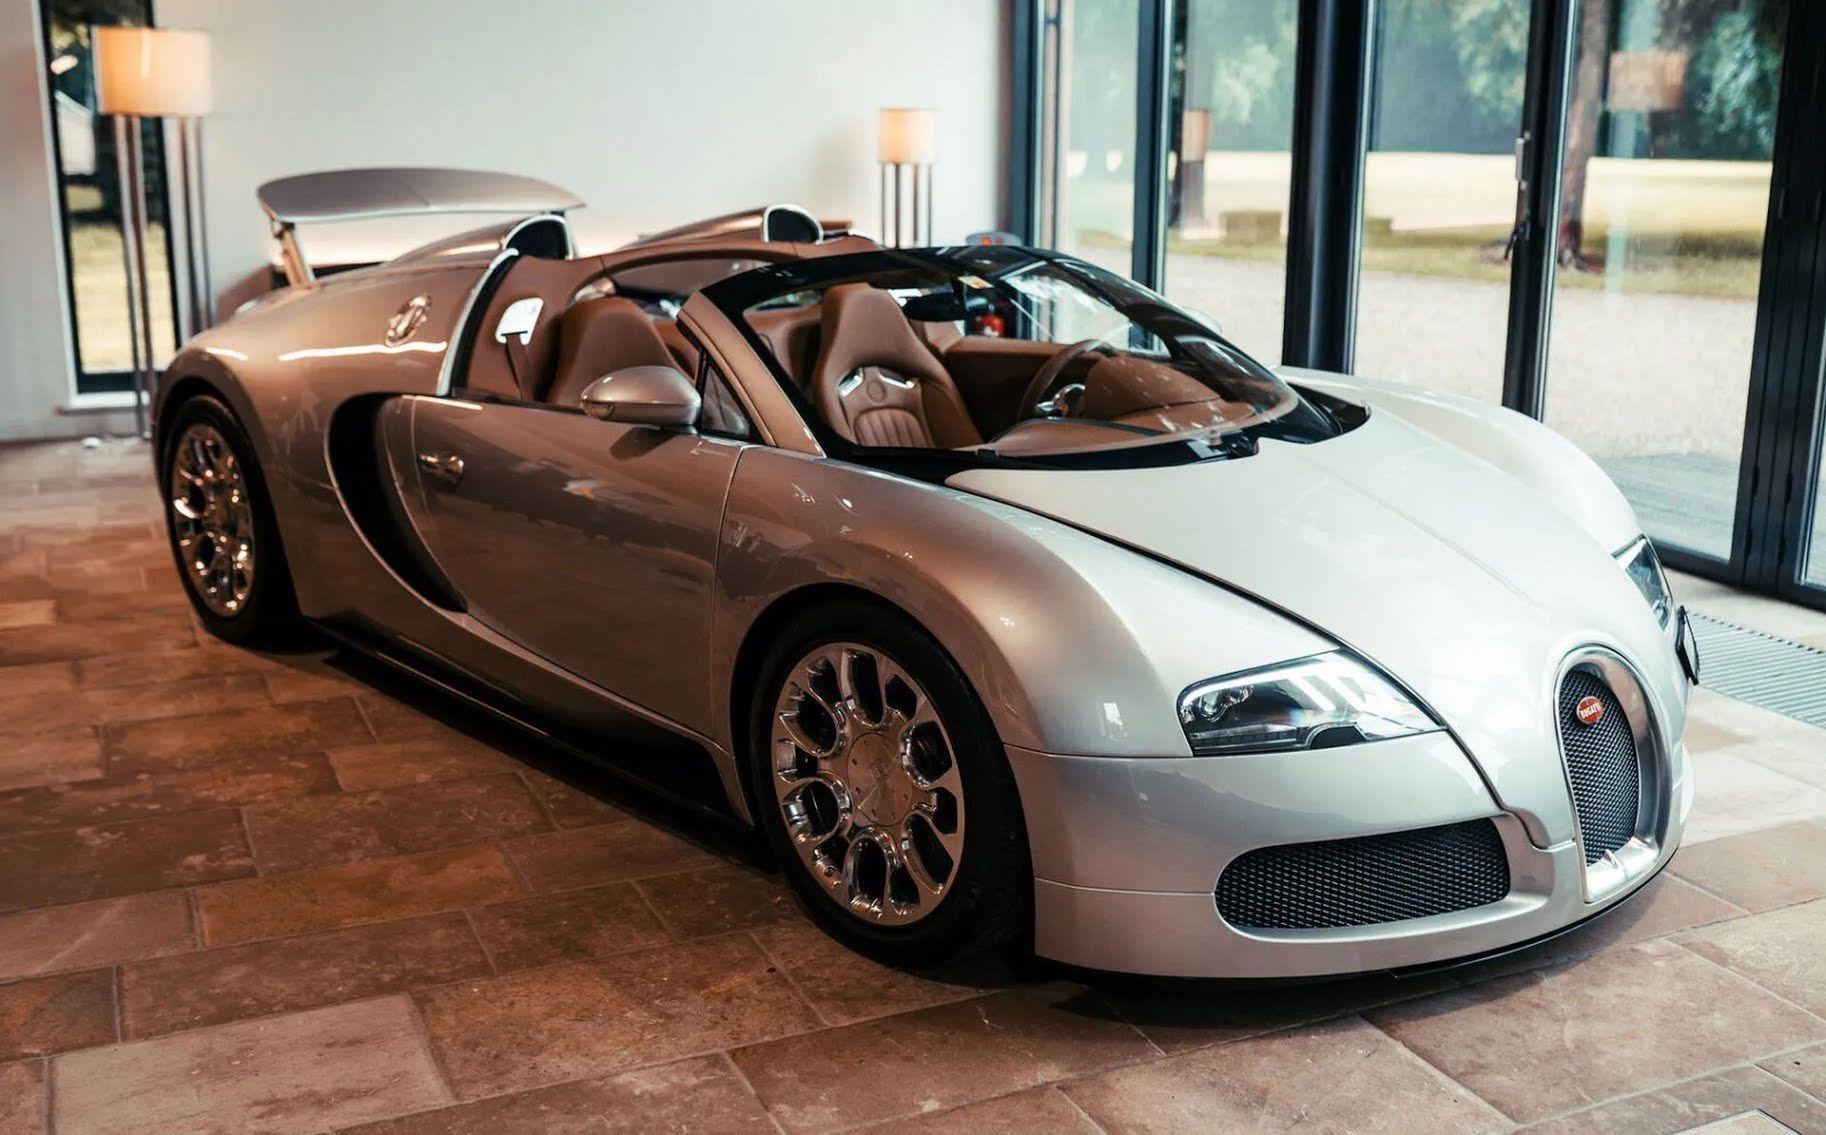 Першим проектом програми La Maison Pur Sang став унікальний прототип Veyron 16.4 Grand Sport